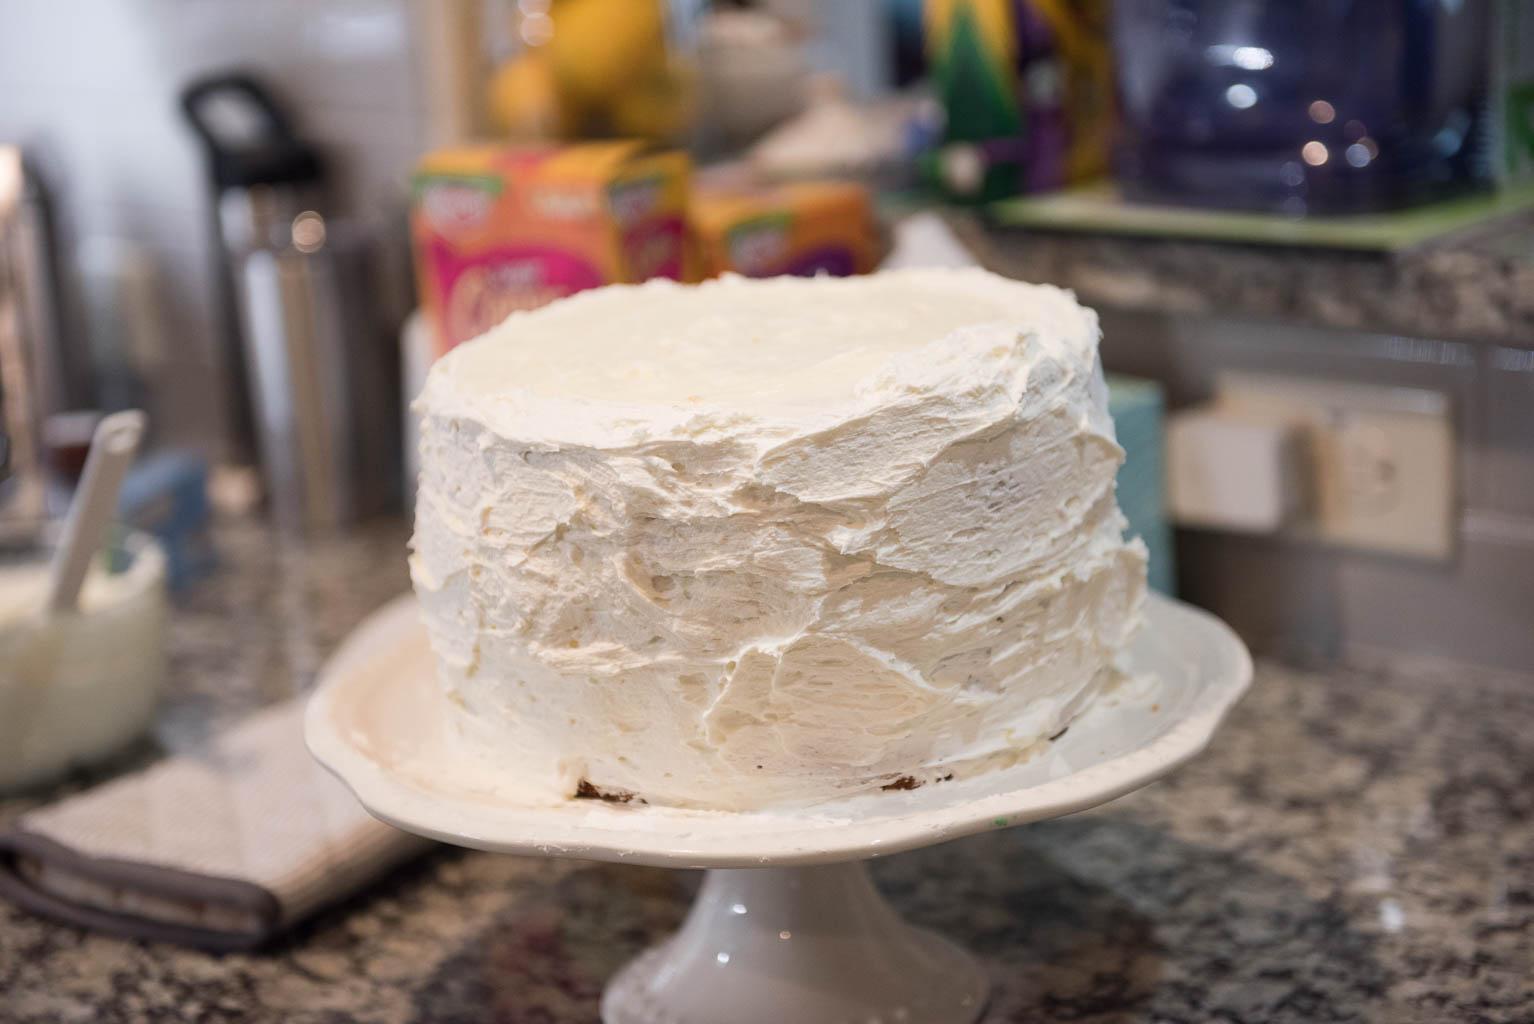 cake-howto-14.jpg